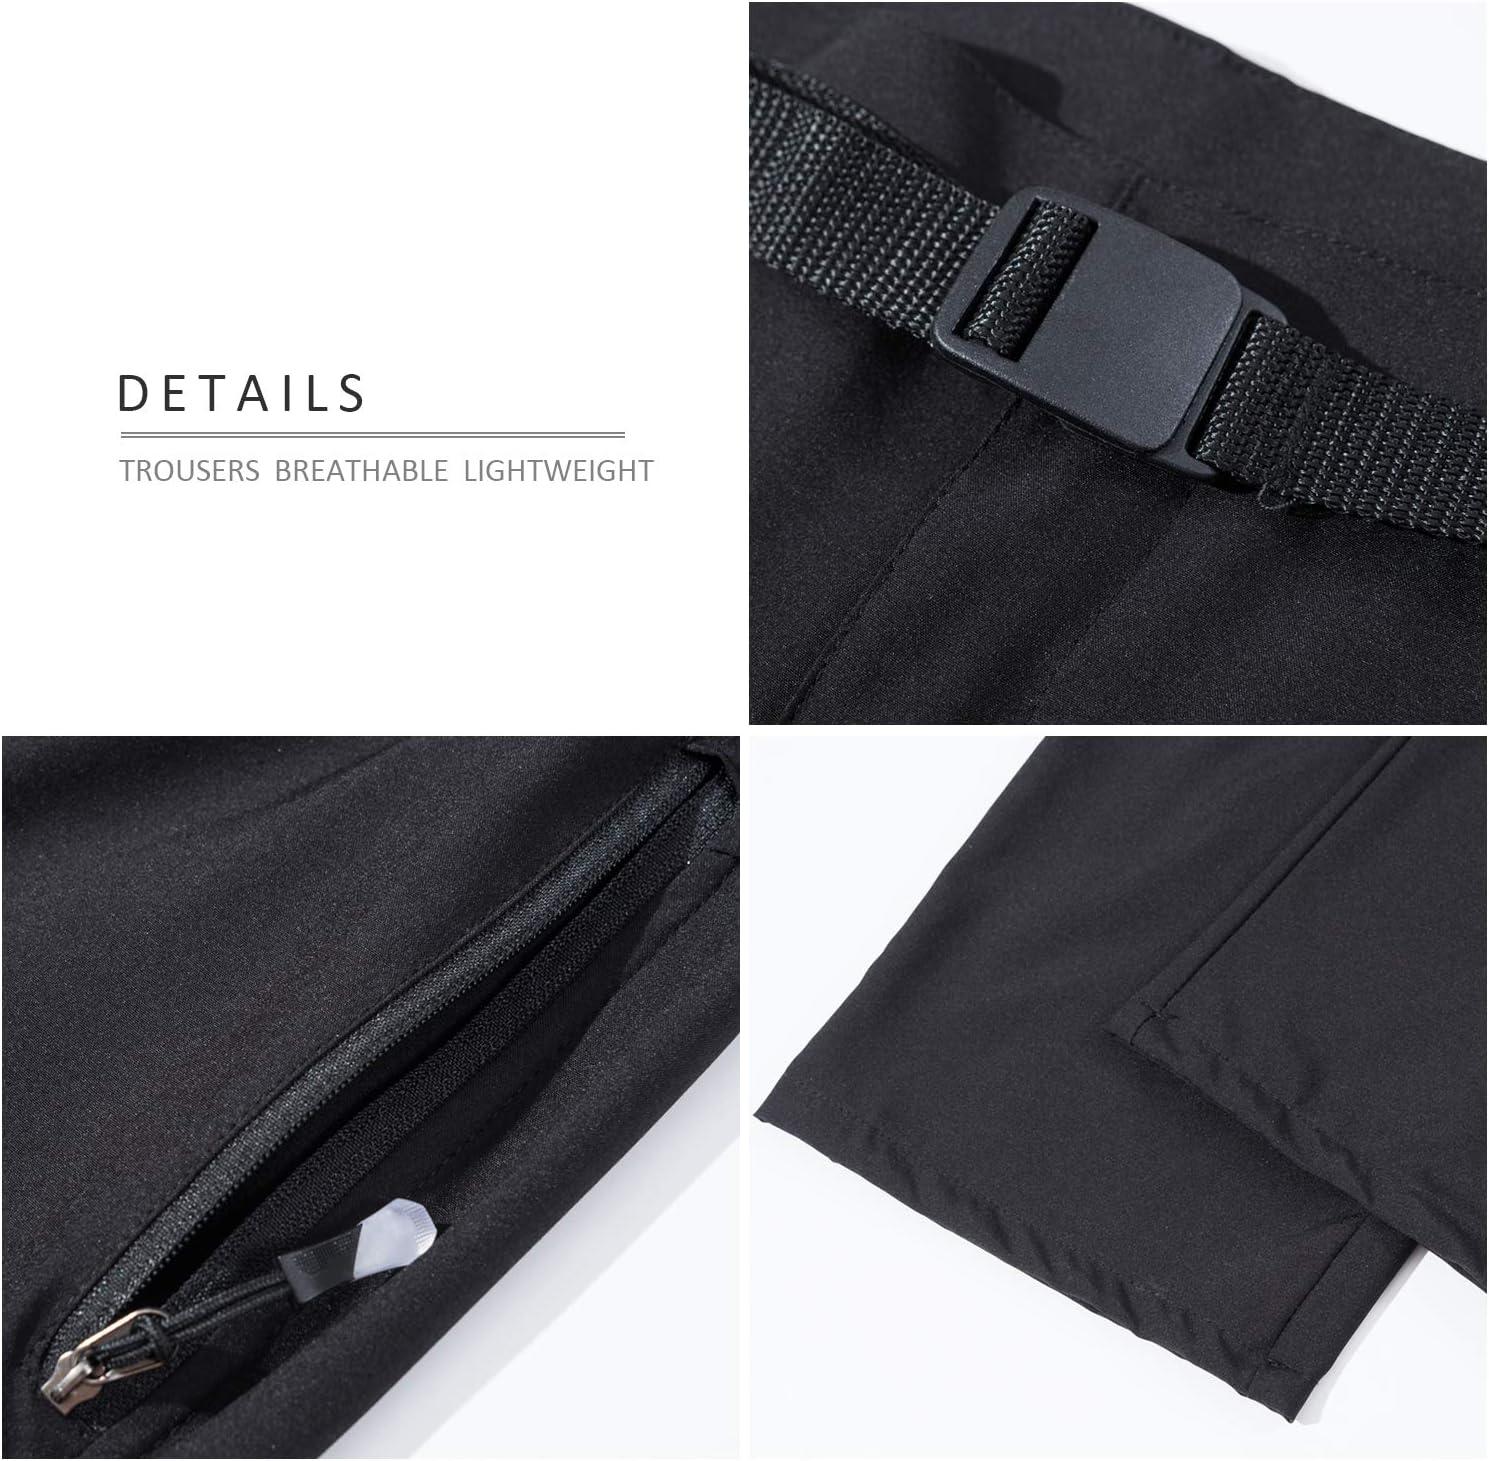 LHHMZ Pantalones de Senderismo con Cremallera Convertible para Hombre al Aire Libre Pantalones Deportivos Shorts